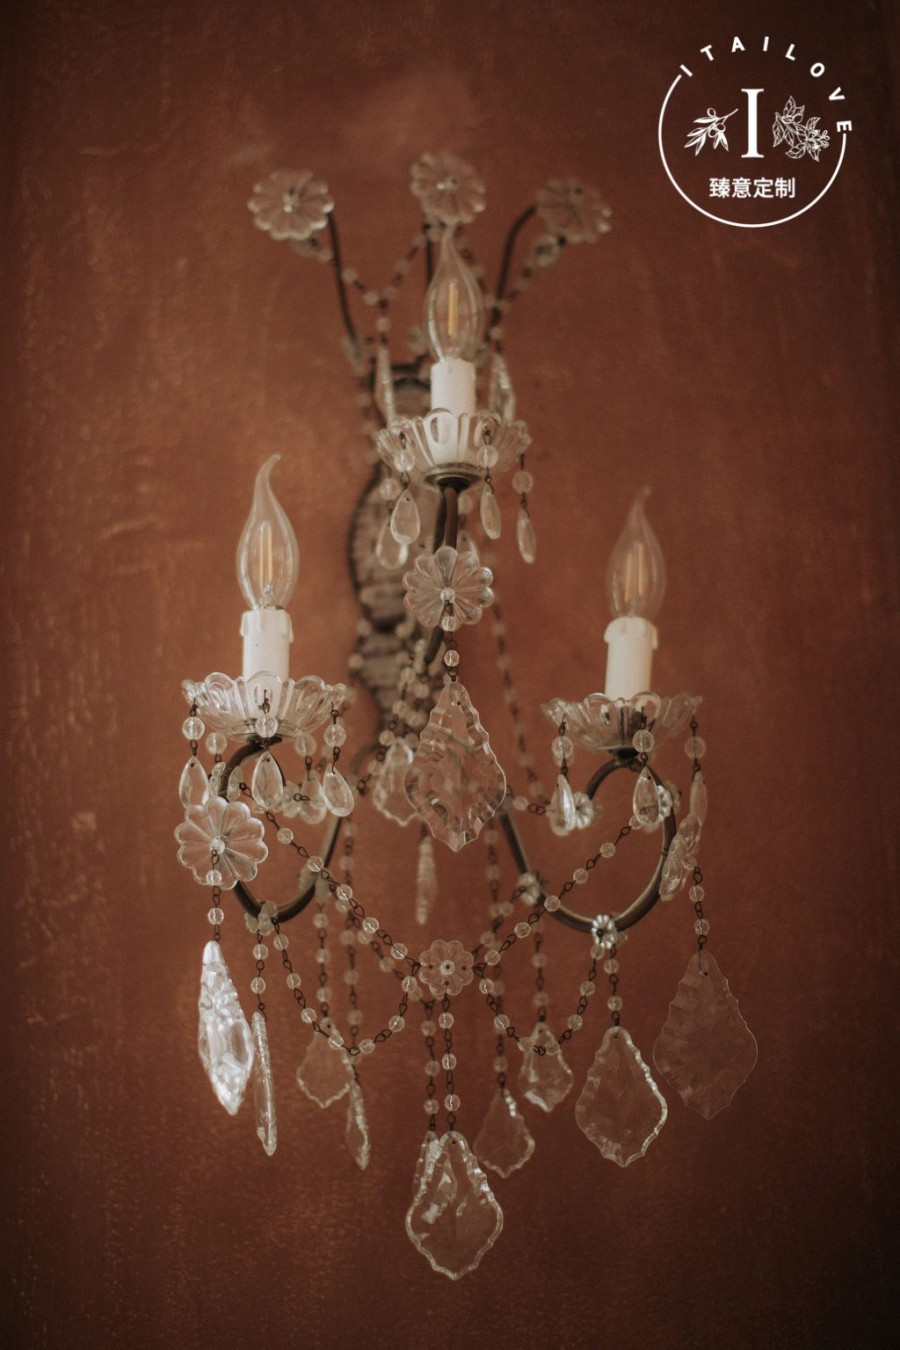 yidali-kemohu-hunli-comolakewedding-itailove (2)